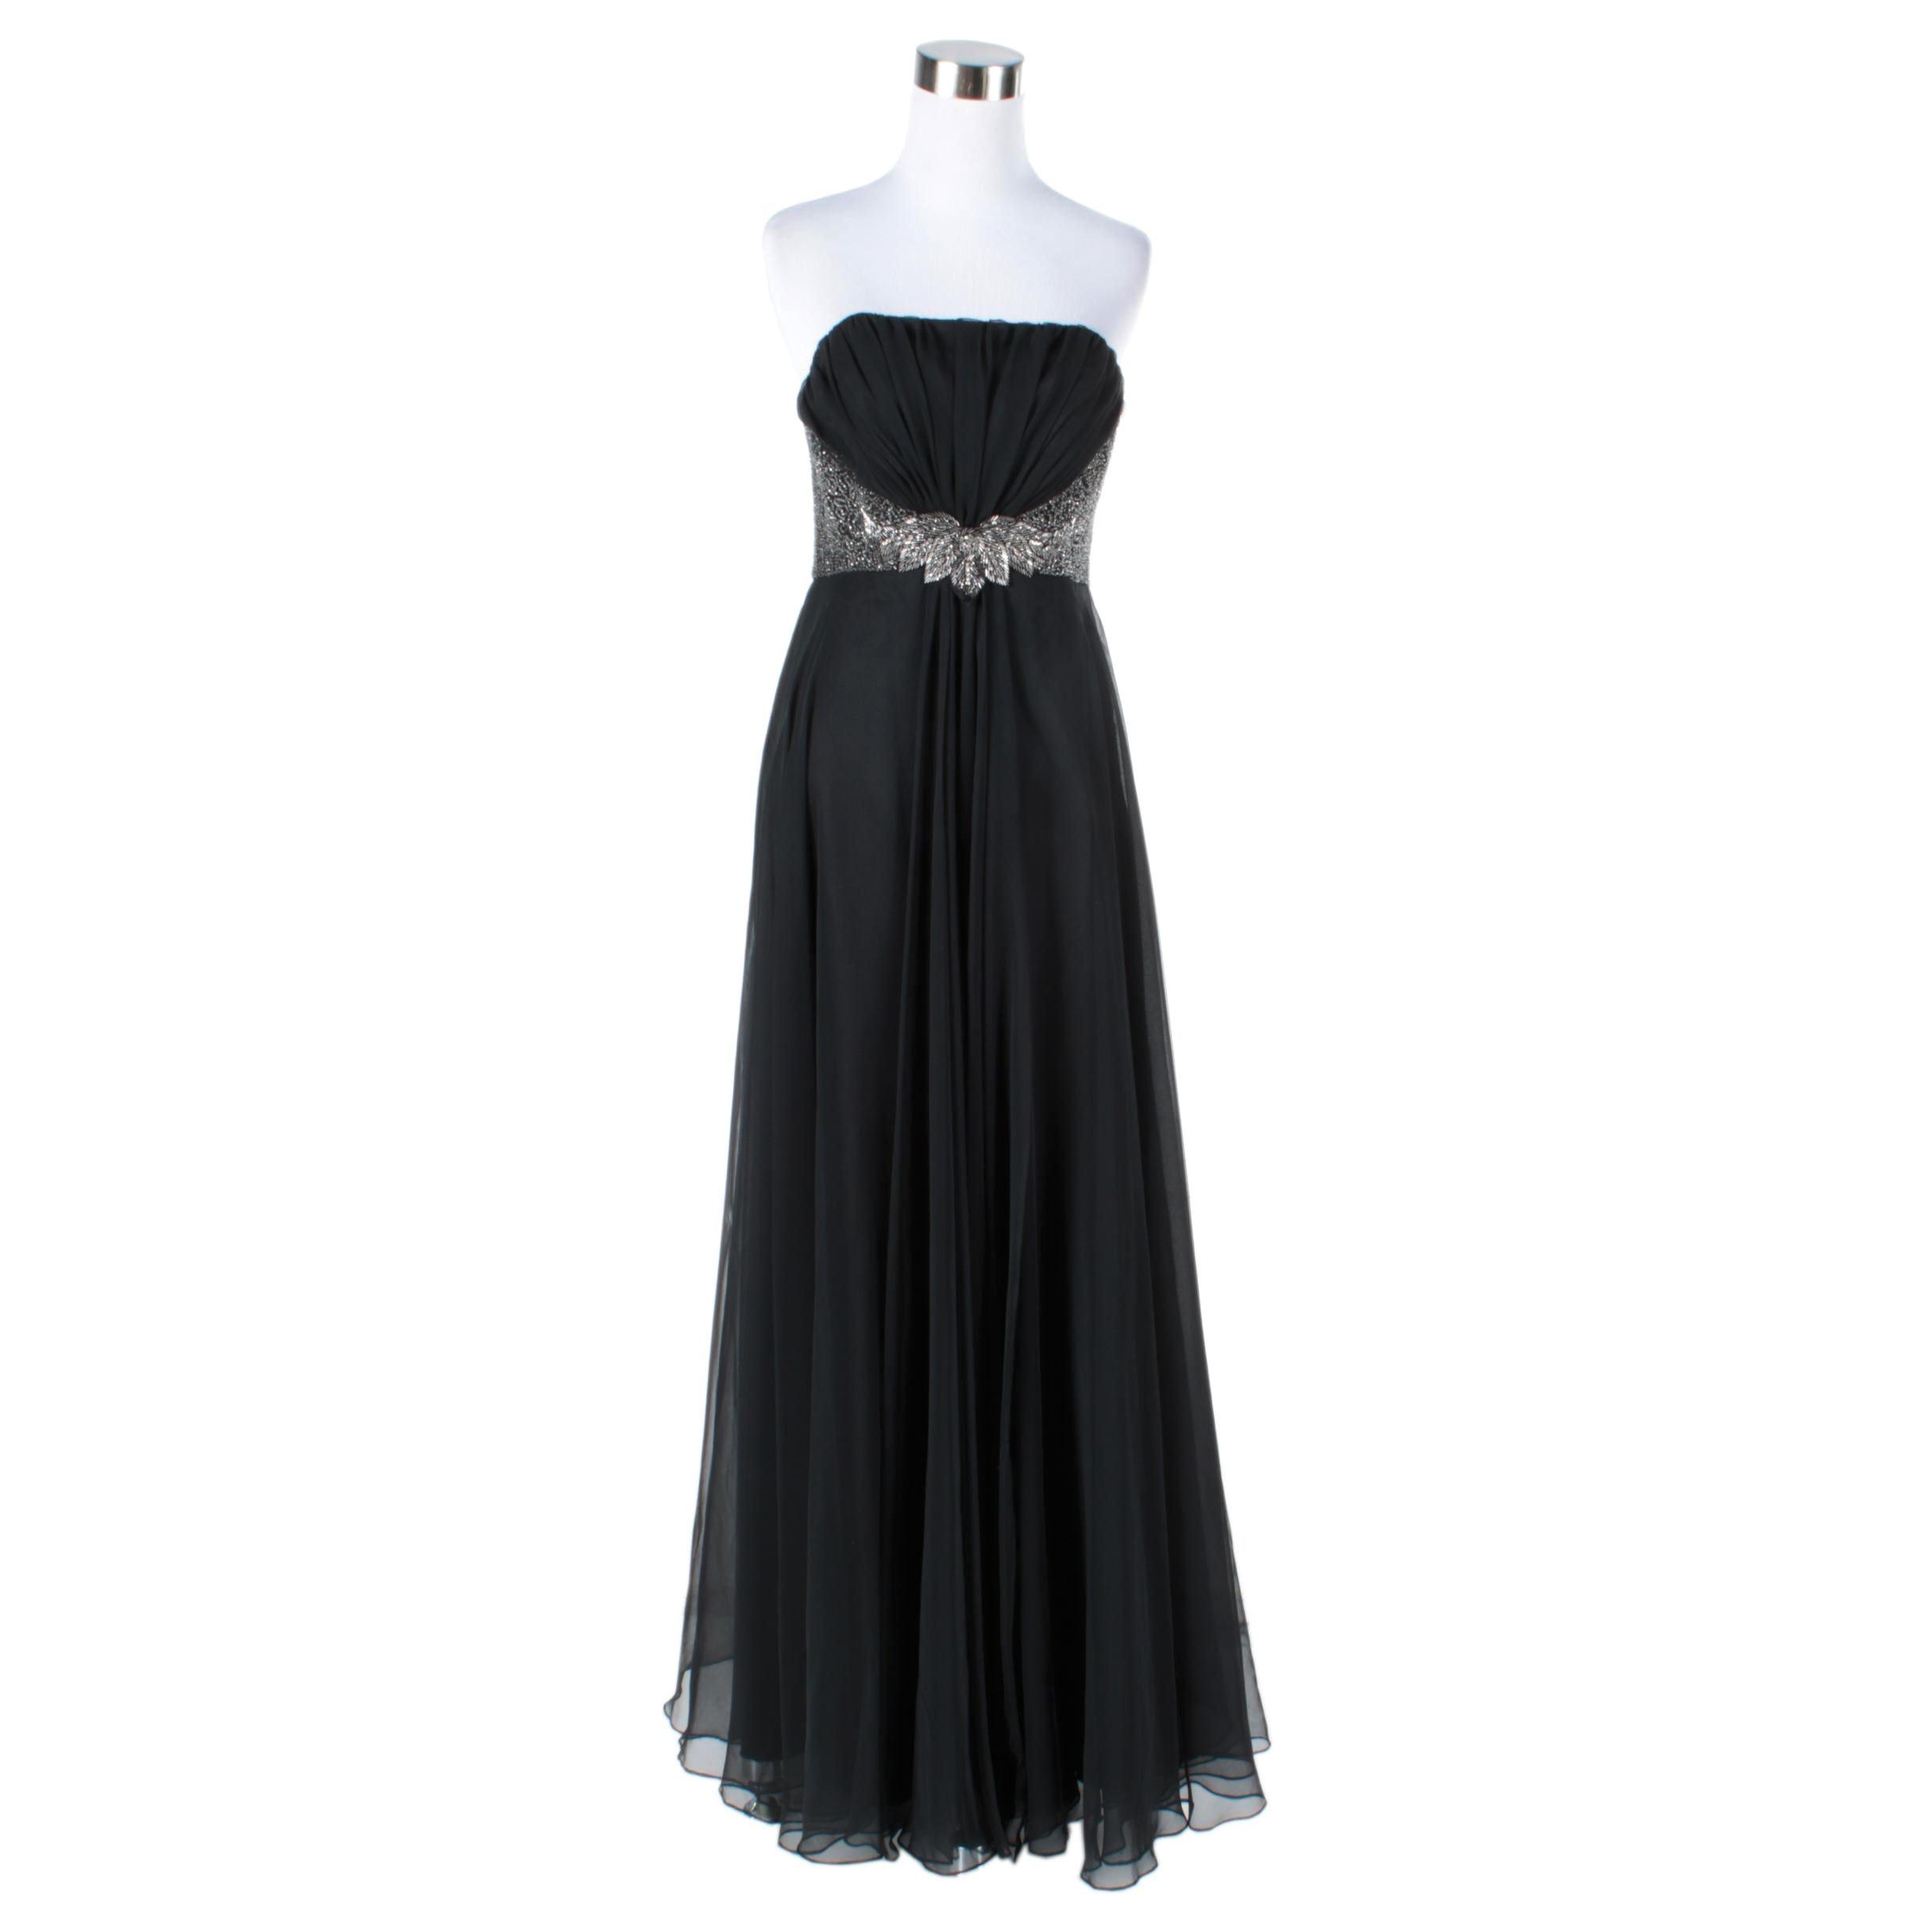 Circa 1970s Vintage Mike Benet Formals Strapless Evening Dress